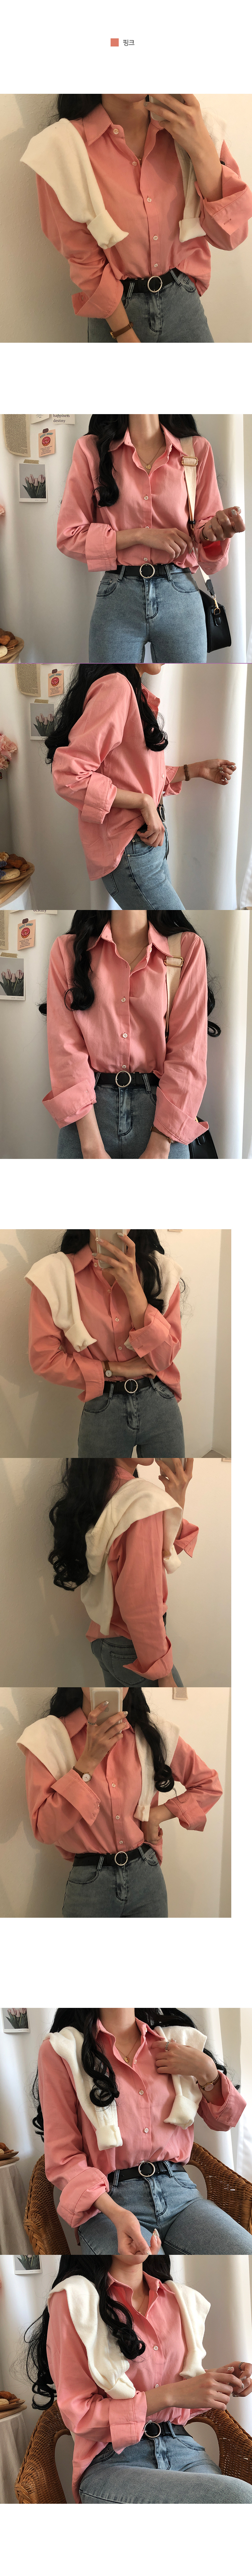 Oxford-style tantan shirt shirt